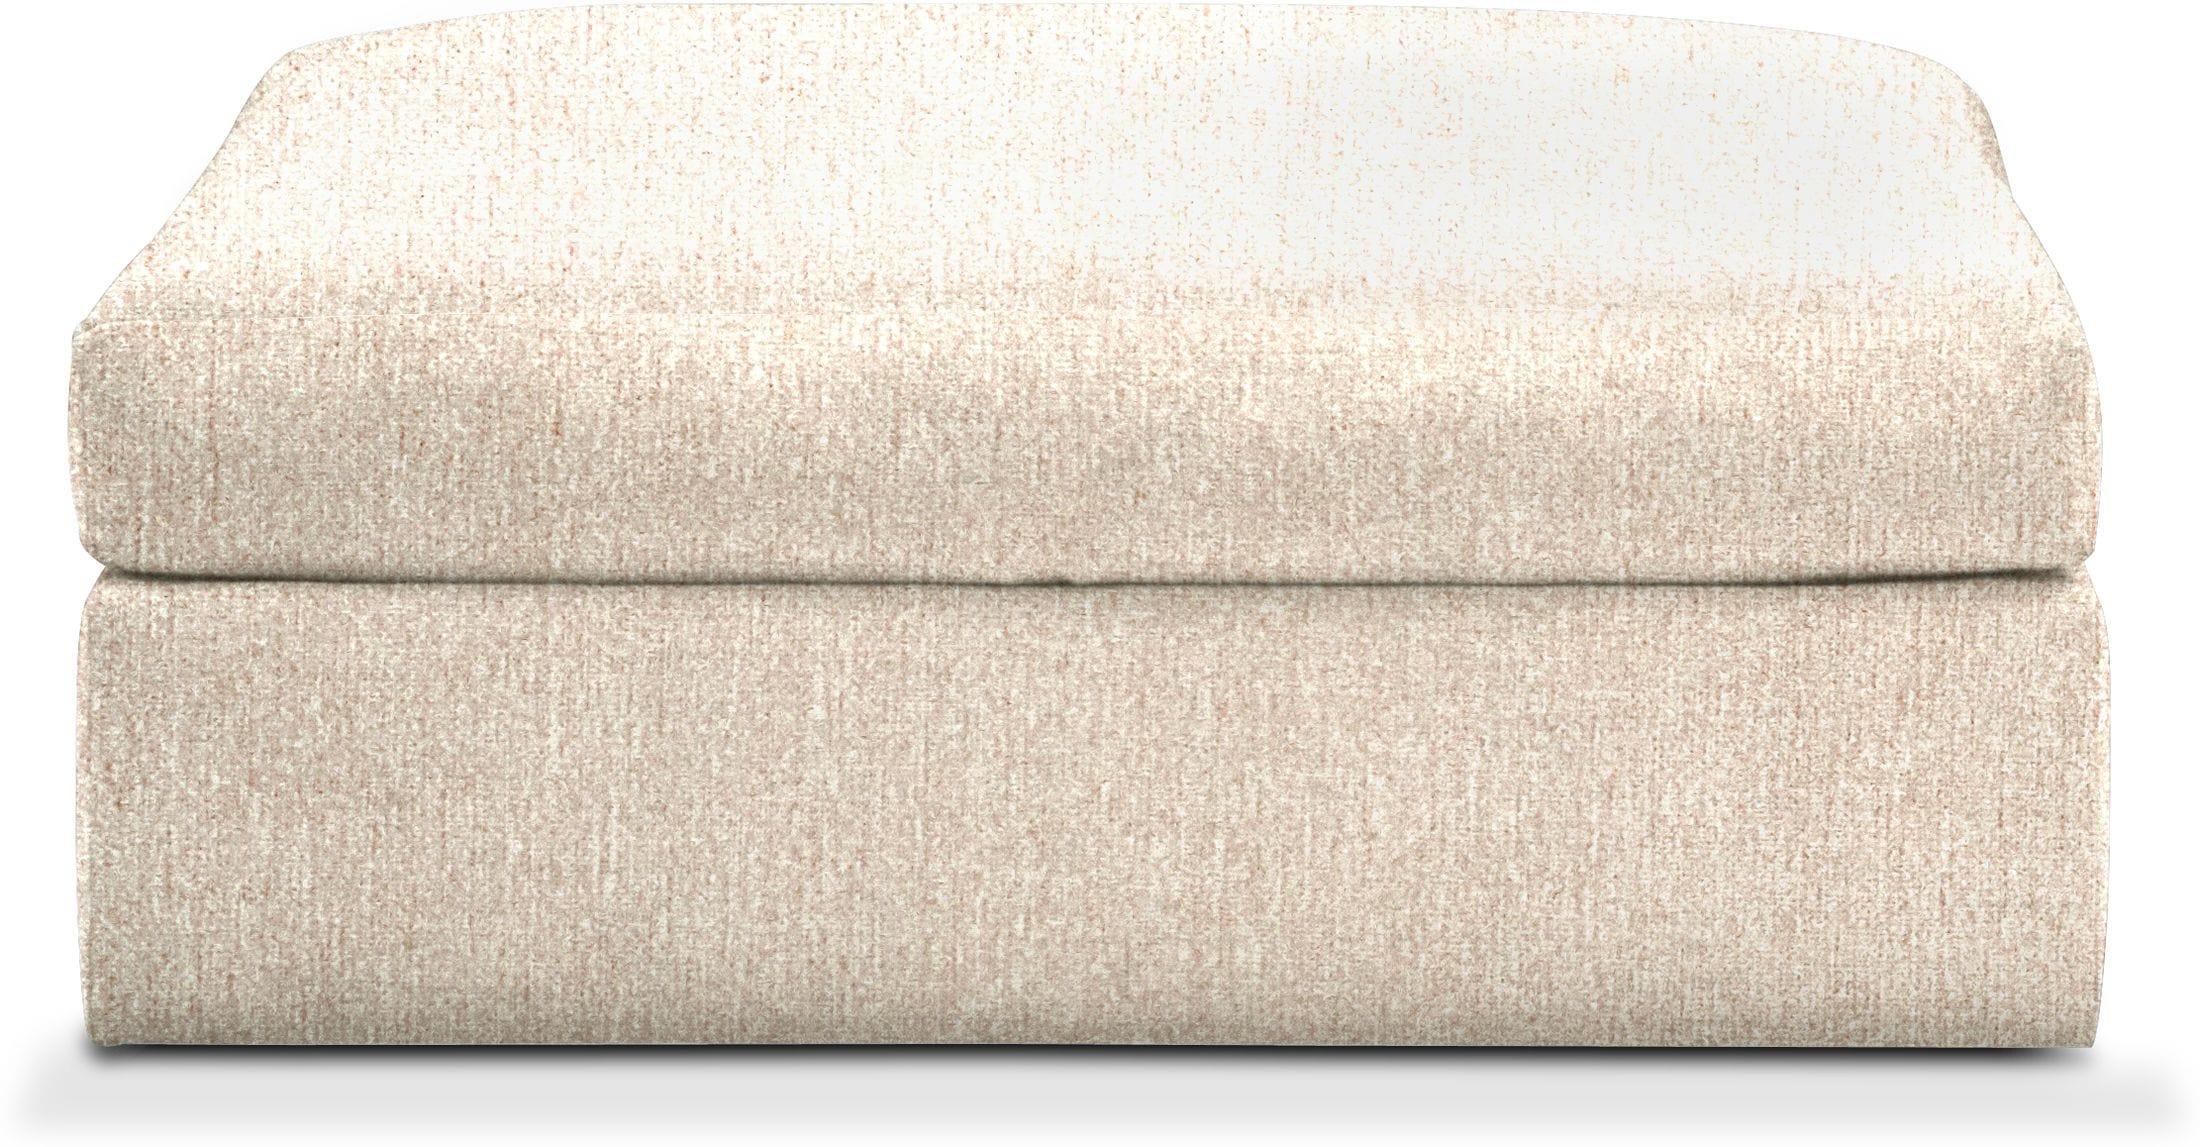 Living Room Furniture - Collin Performance Ottoman